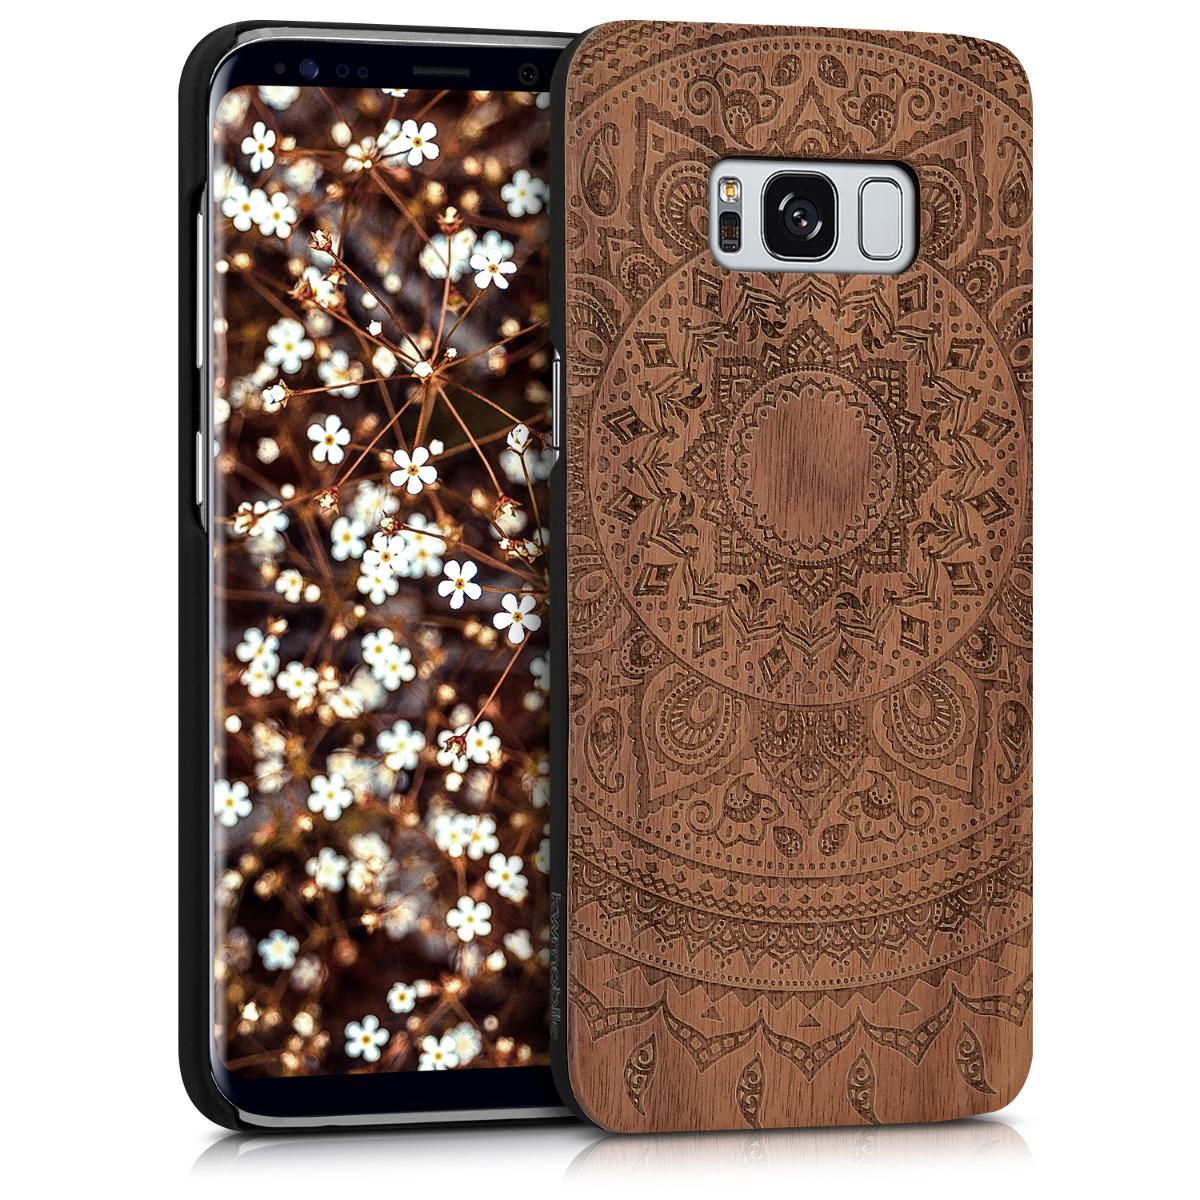 KW Σκληρή Ξύλινη Θήκη Samsung Galaxy S8 (40979.01)